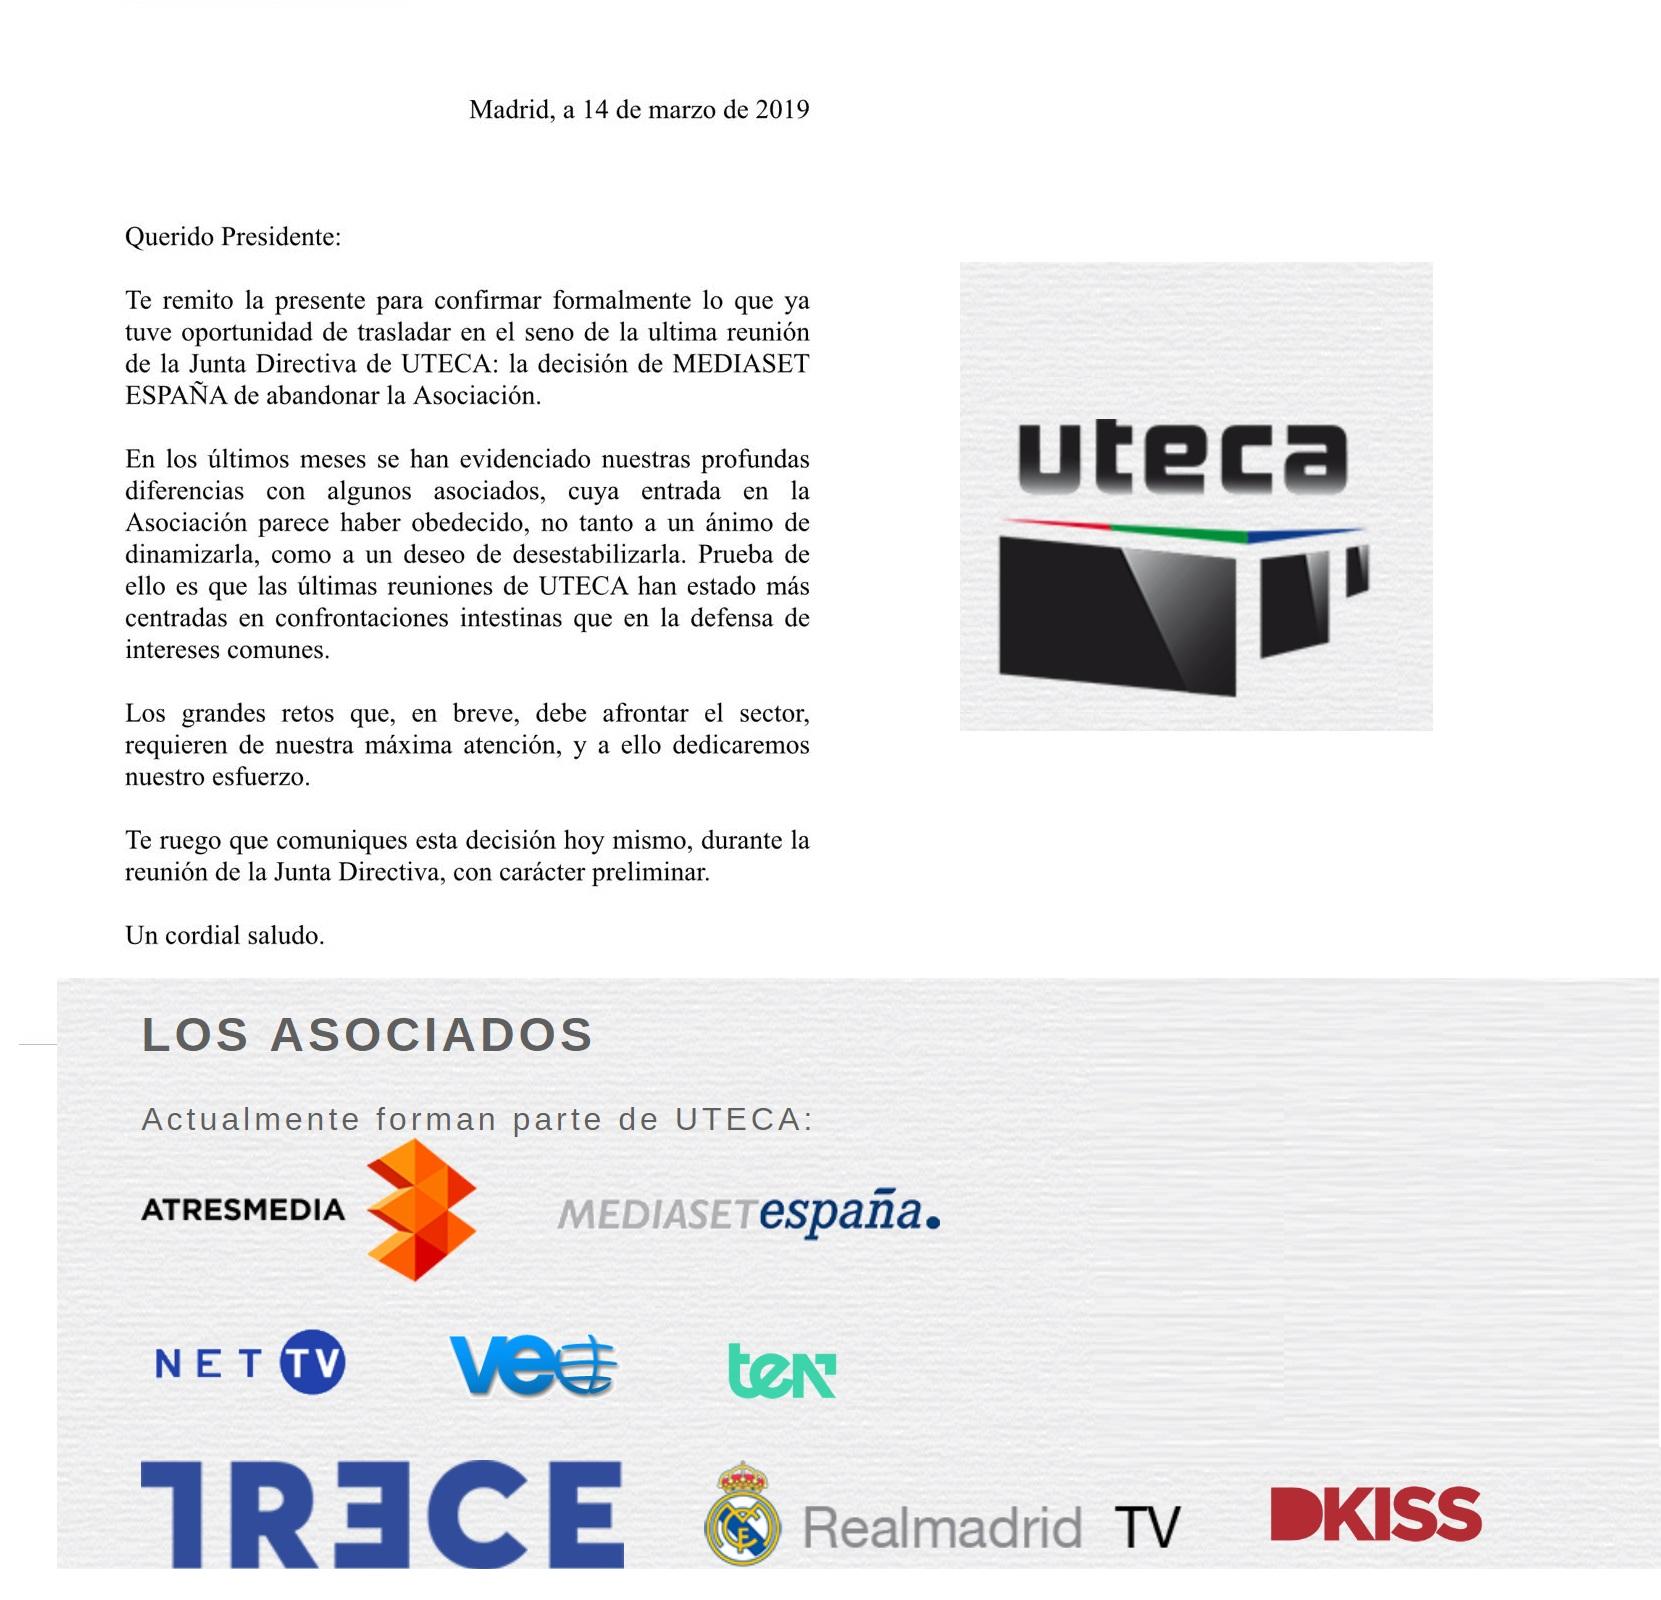 https://www.programapublicidad.com/wp-content/uploads/2019/03/carta-UTECA-programapublicidad-muy-grande.jpg